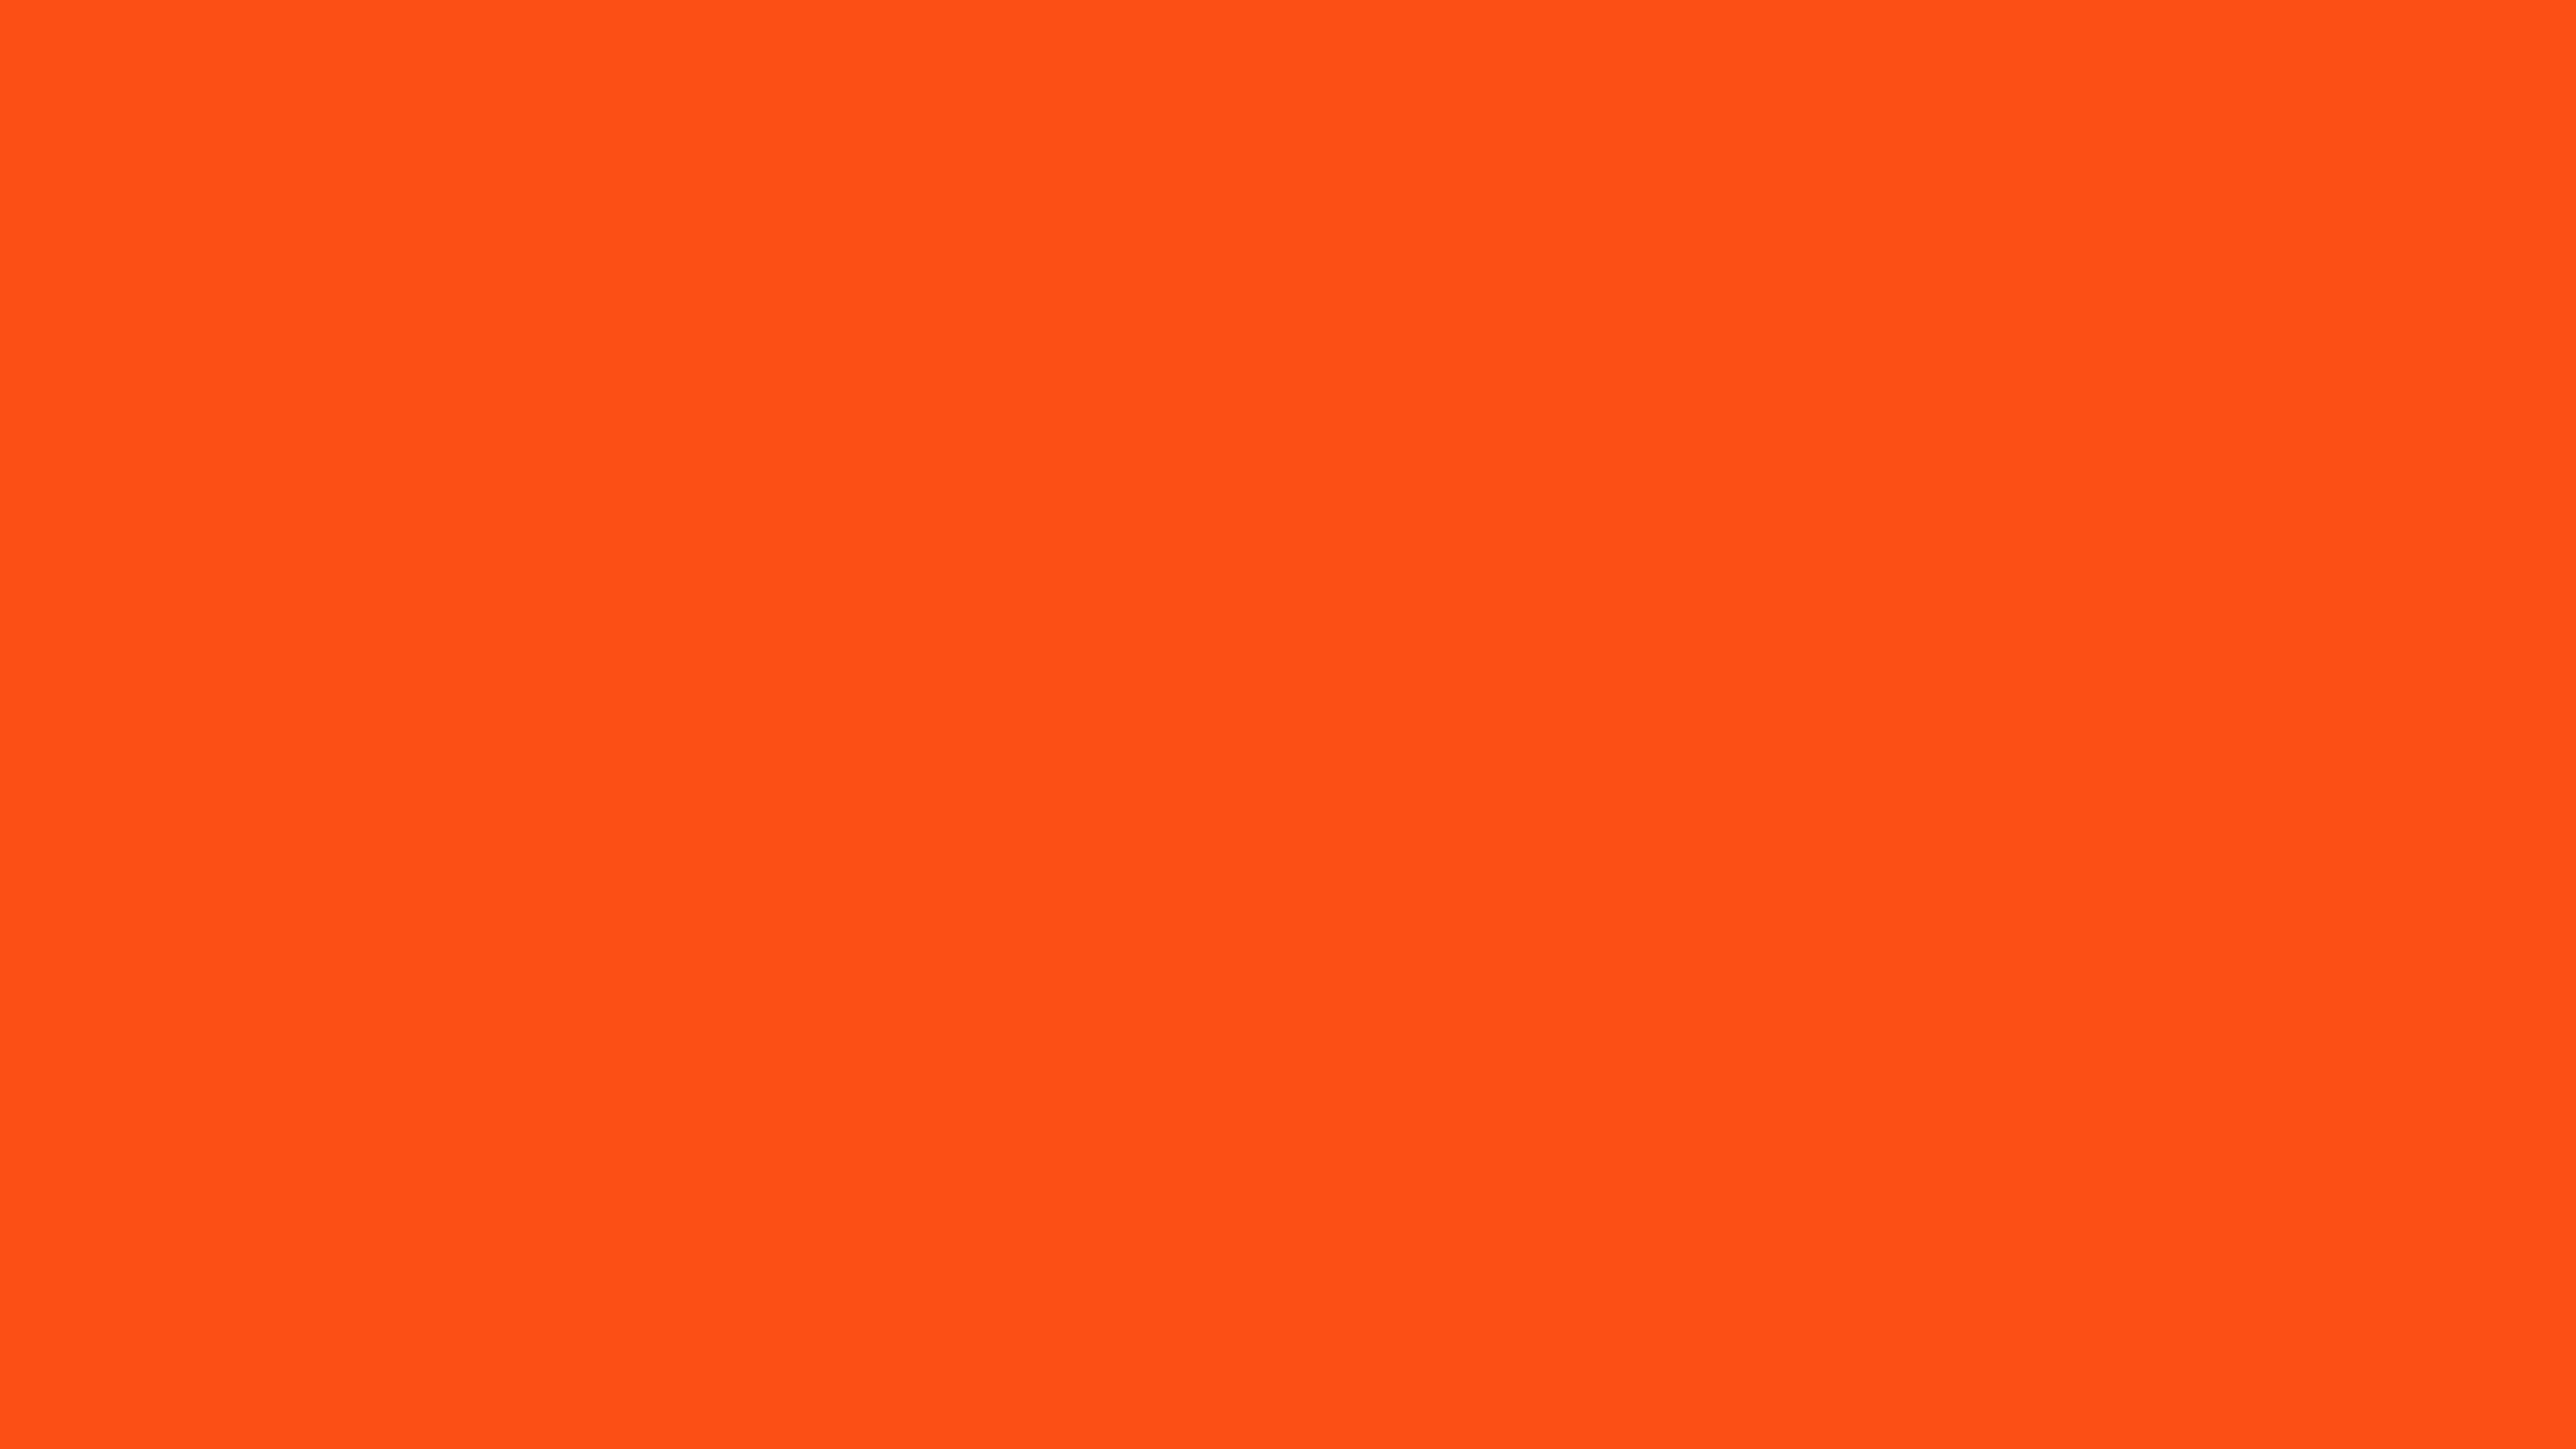 4096x2304 Orioles Orange Solid Color Background